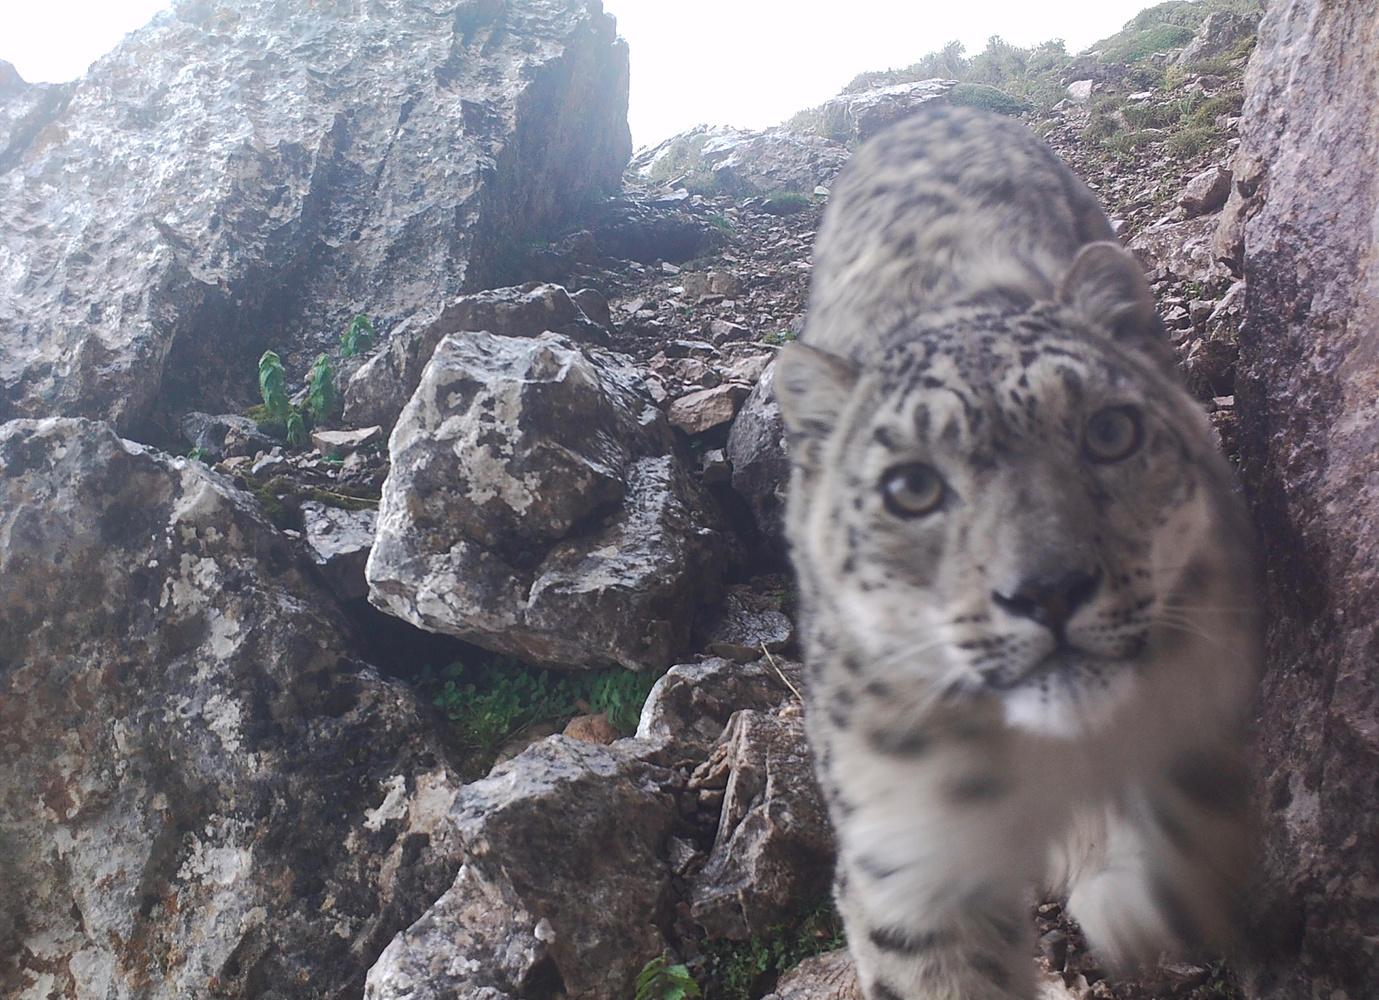 Elusive Snow Leopard Shoots Purrfect Selfies | Fstoppers